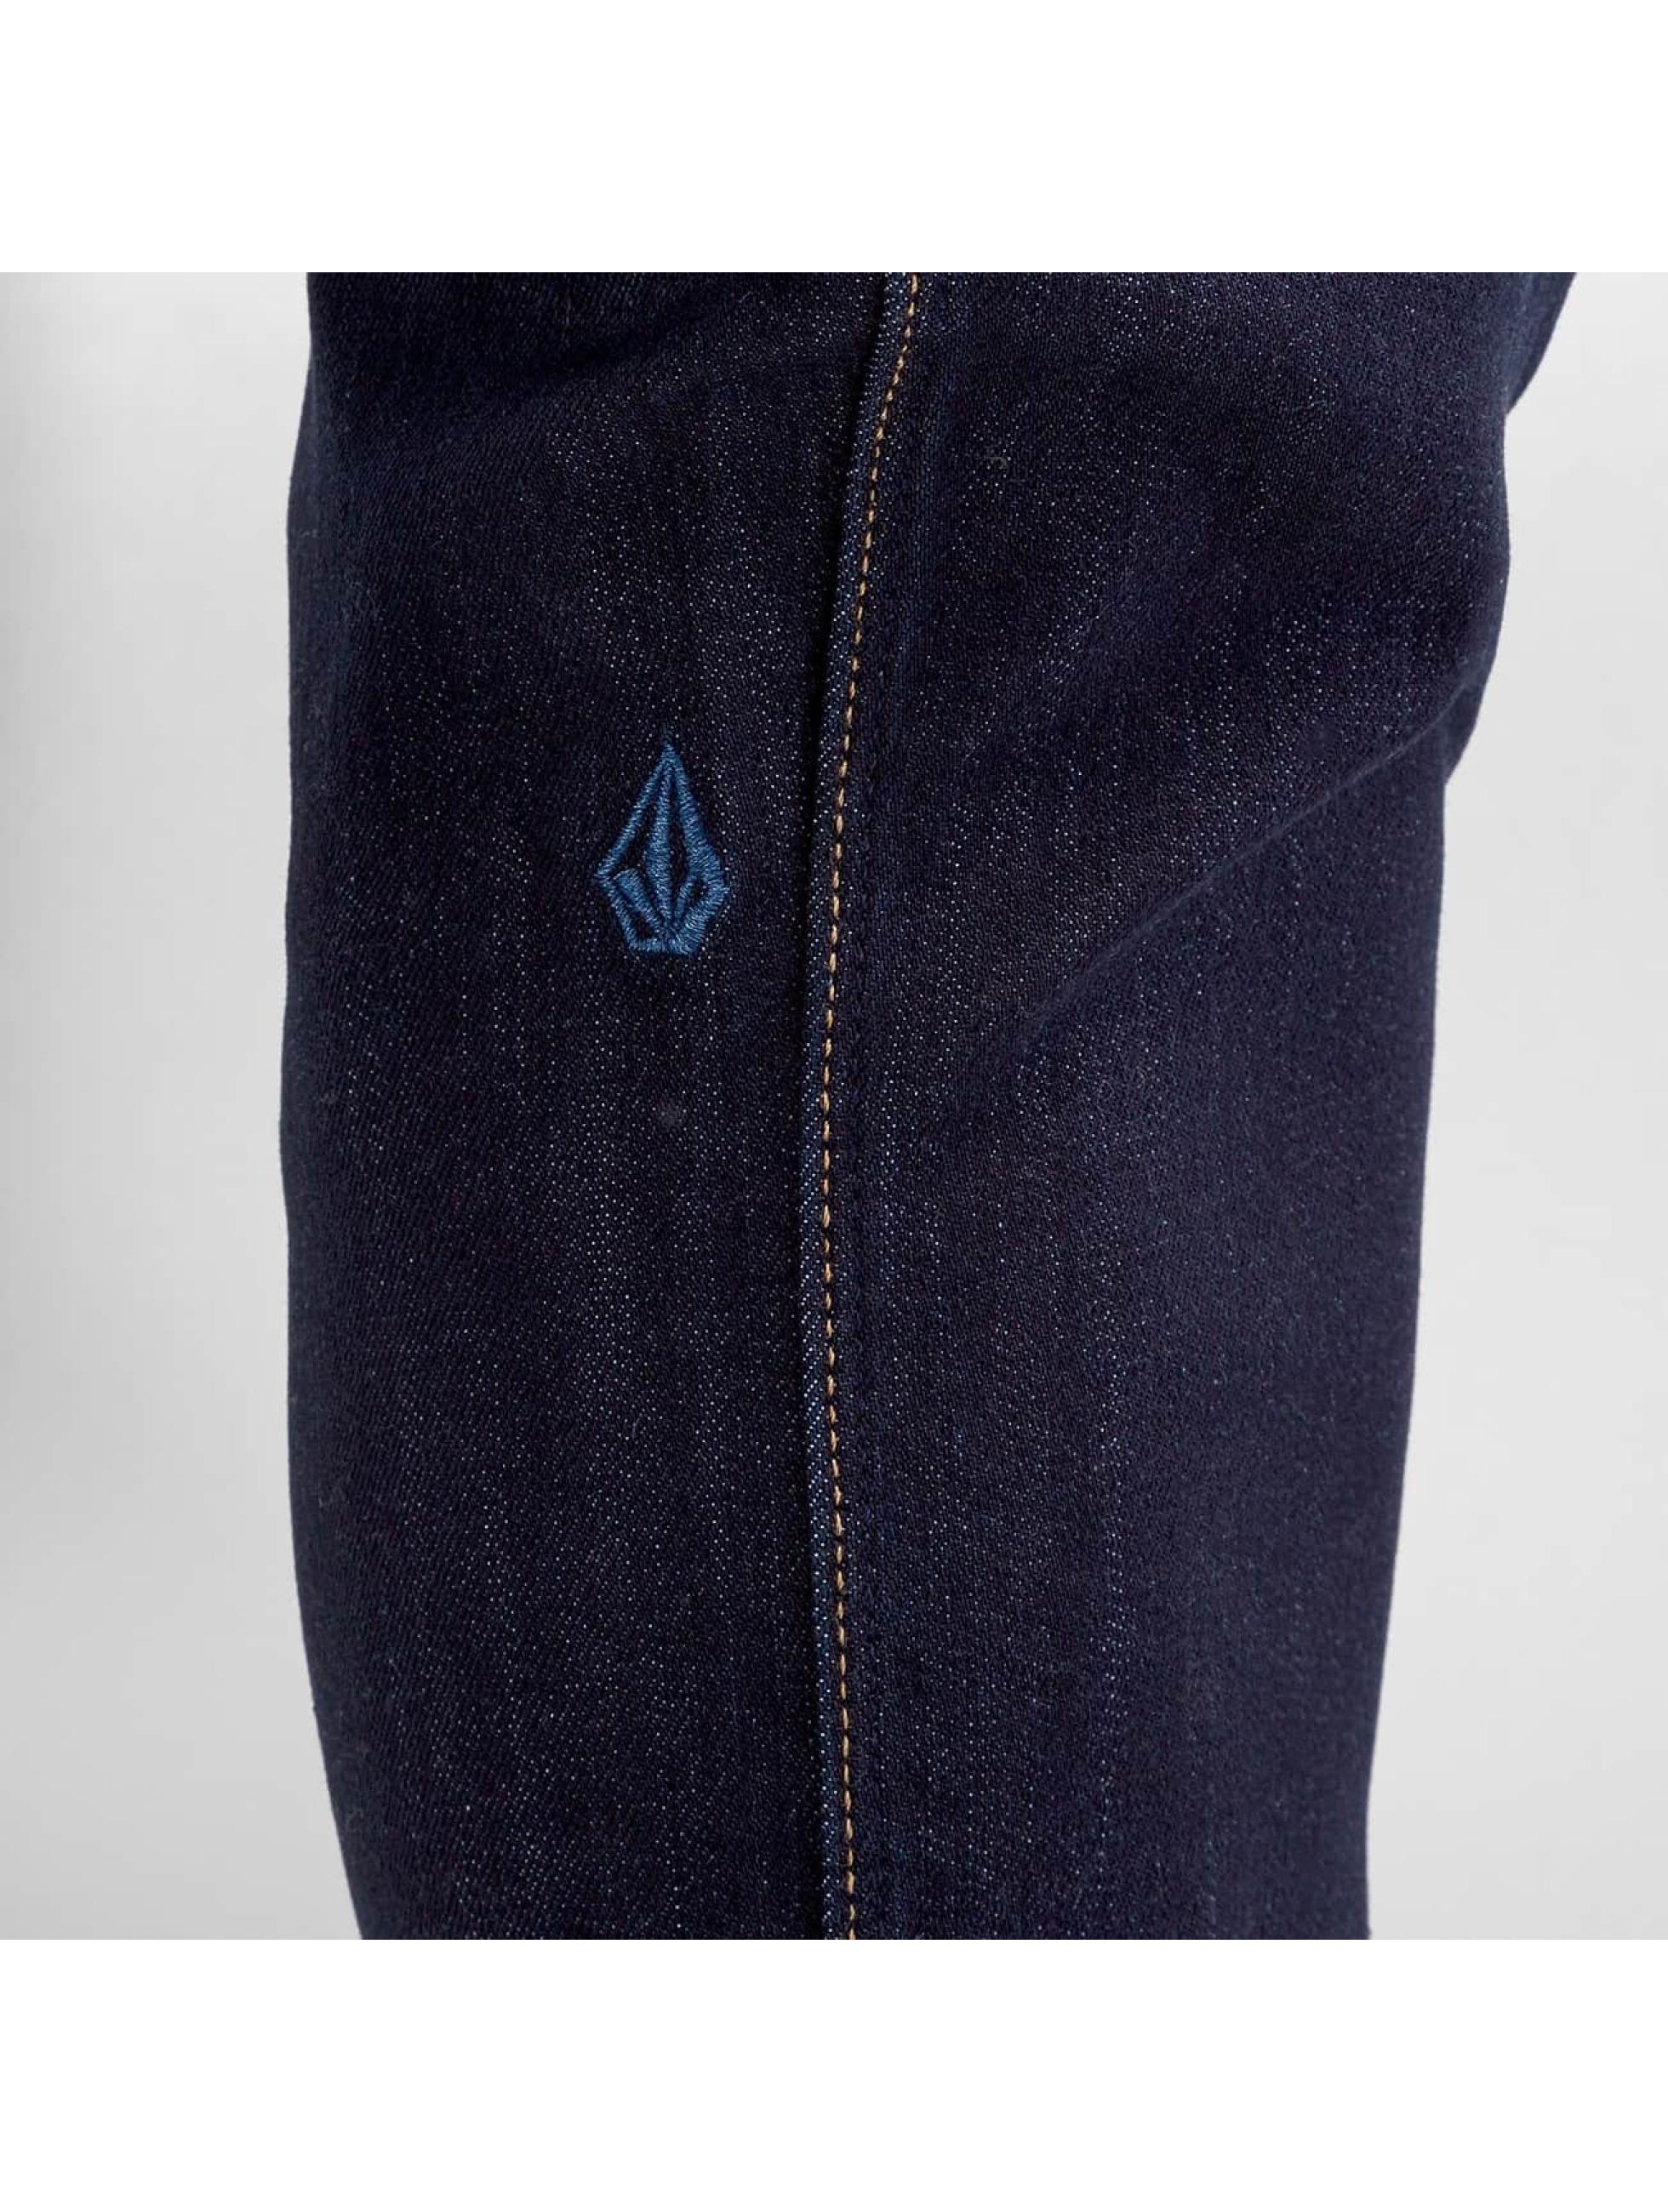 Volcom Джинсы прямого покроя 2x4 Denim синий